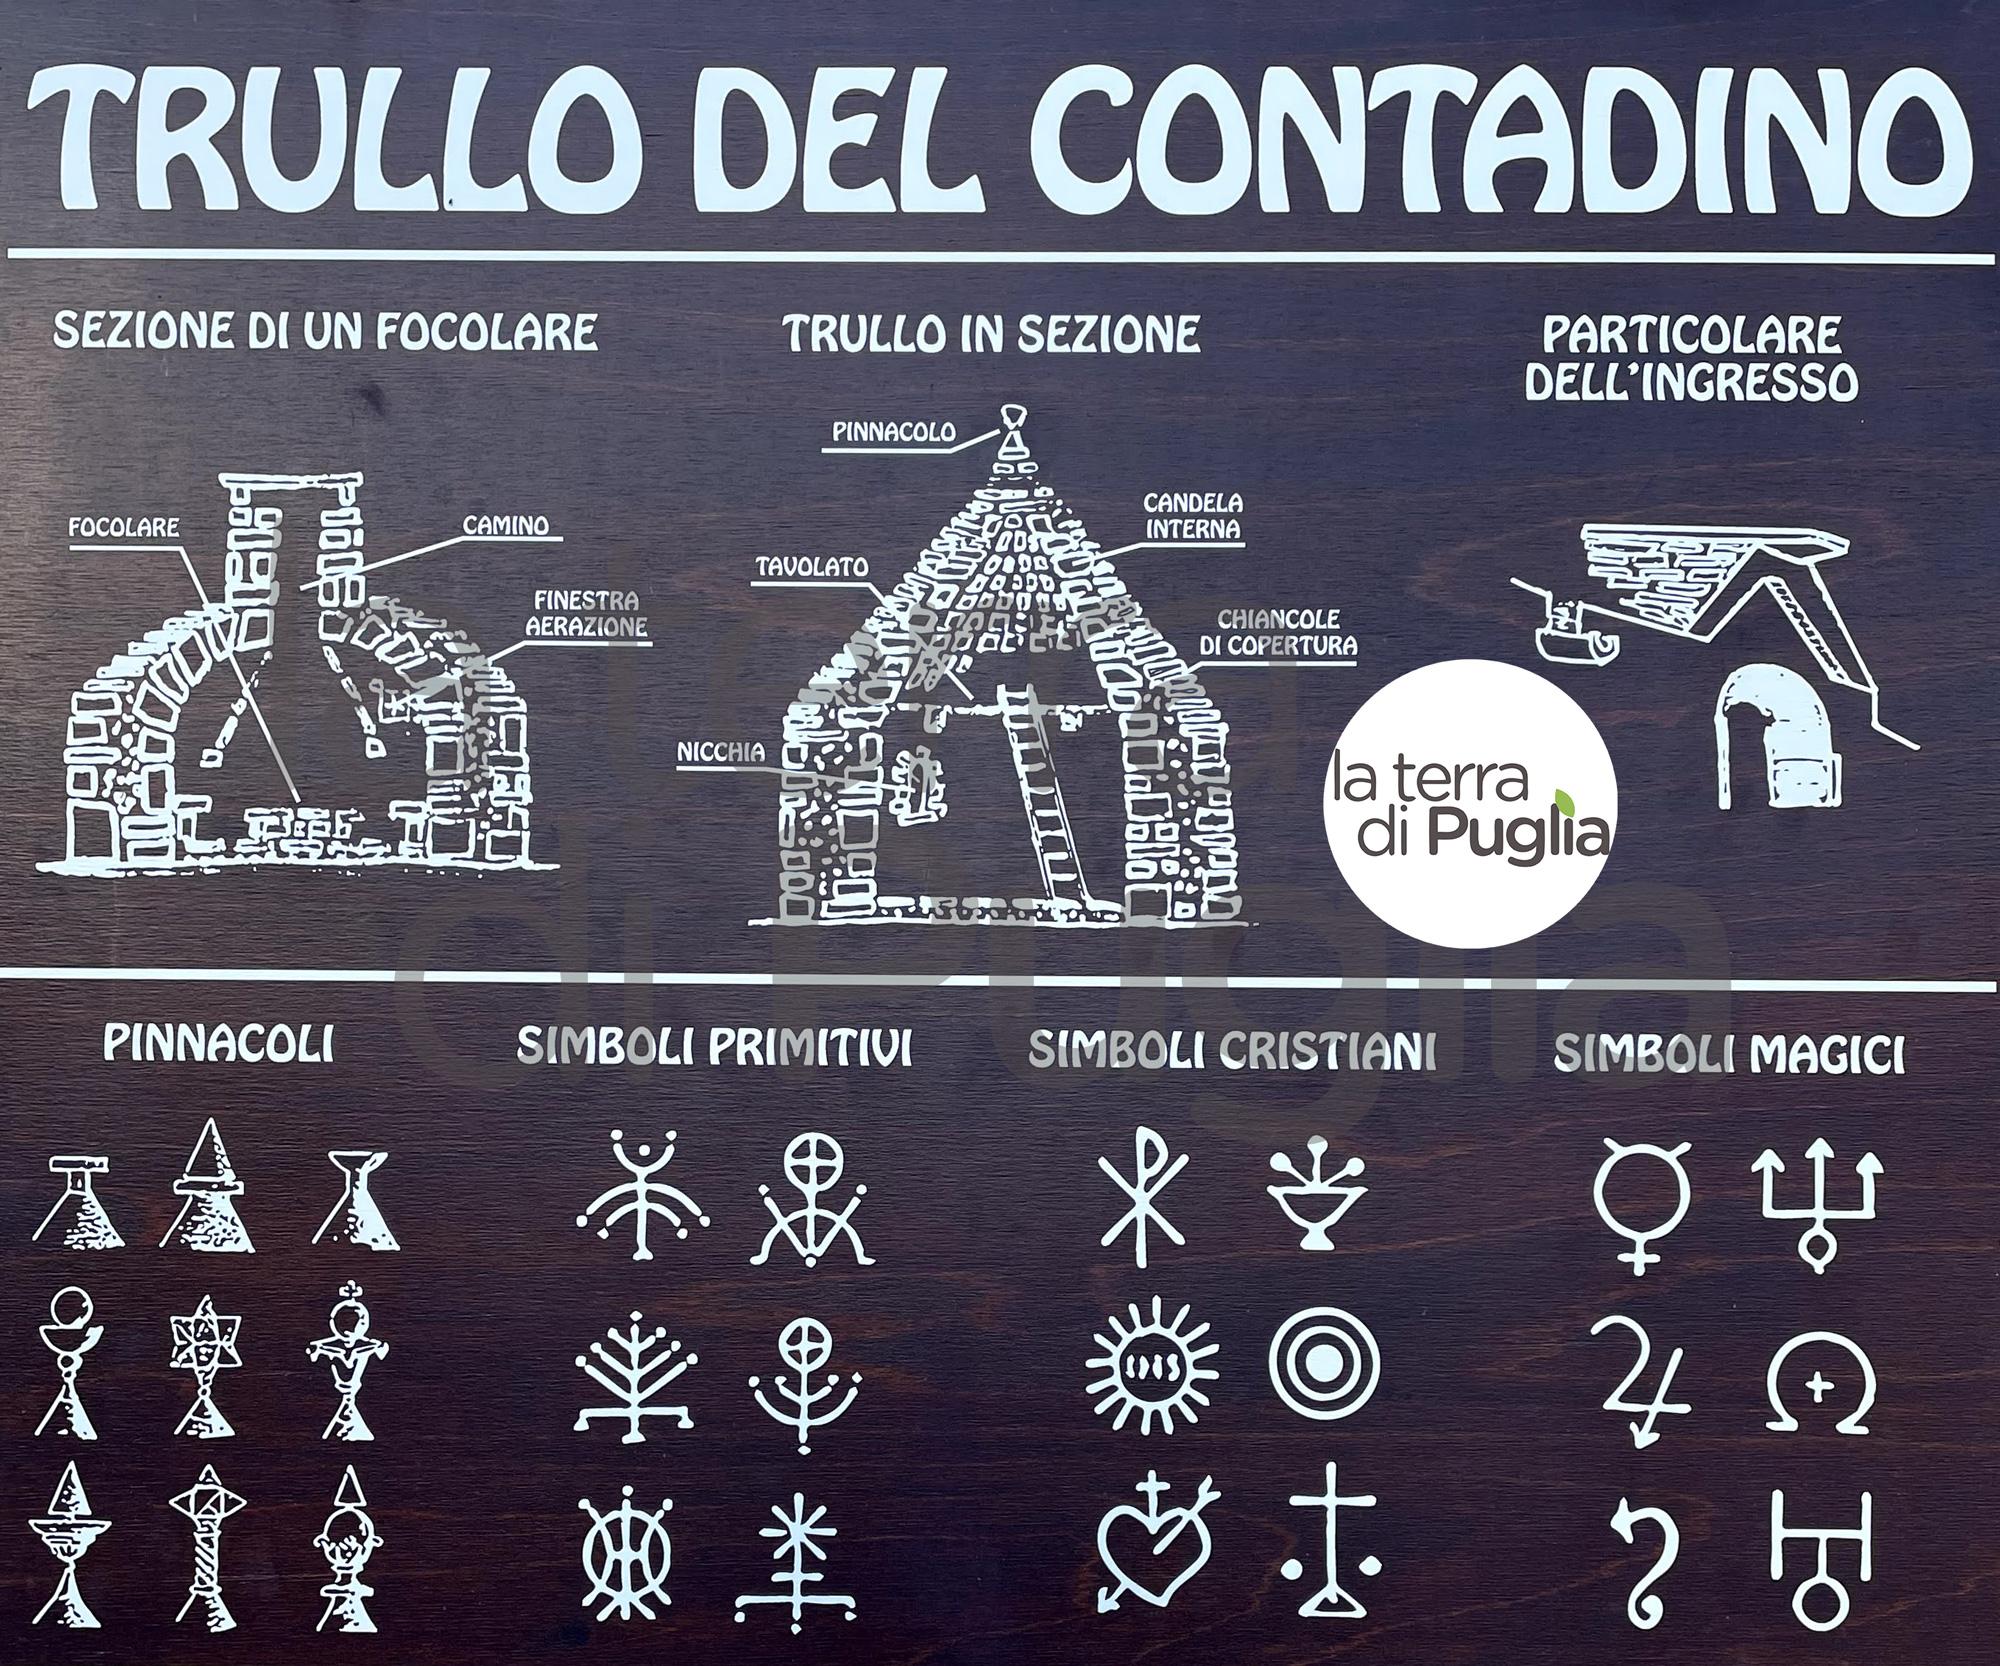 simboli-trulli-alberobello